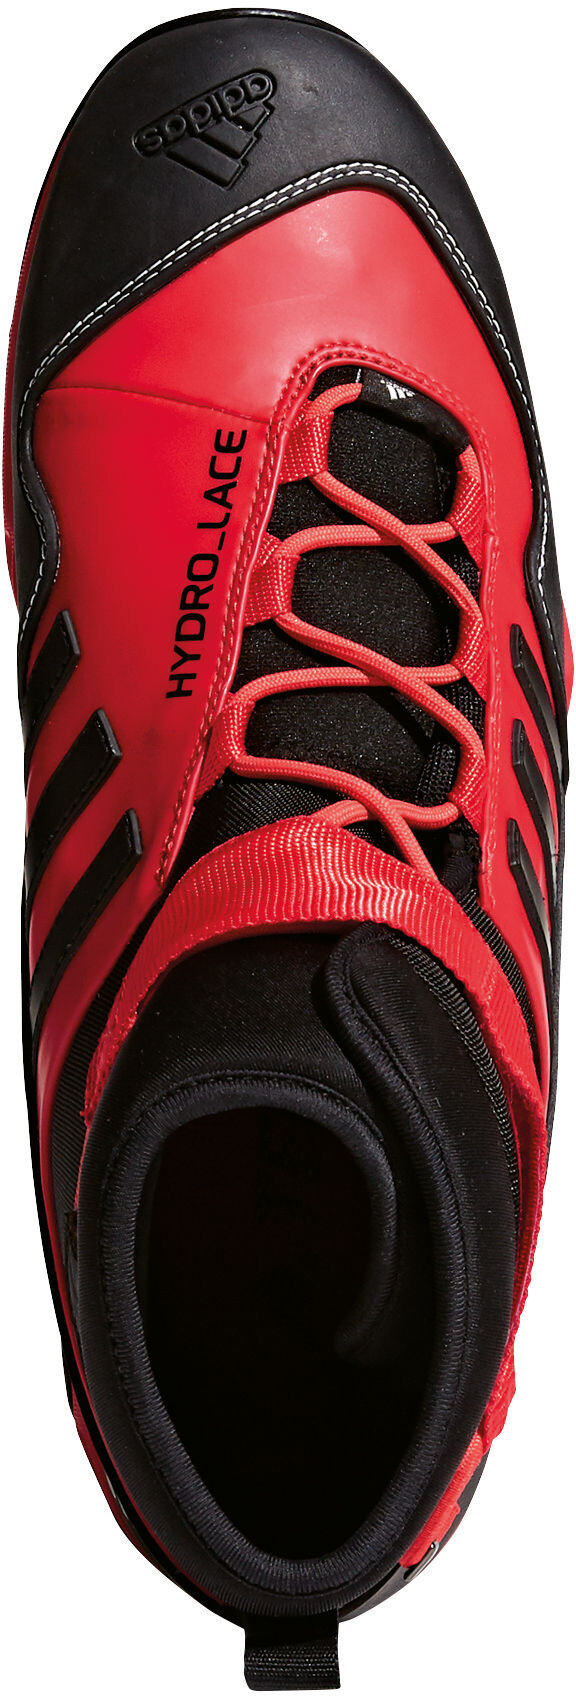 adidas TERREX Hydro Lace Chaussures Homme, hi res redcore blackchalk white